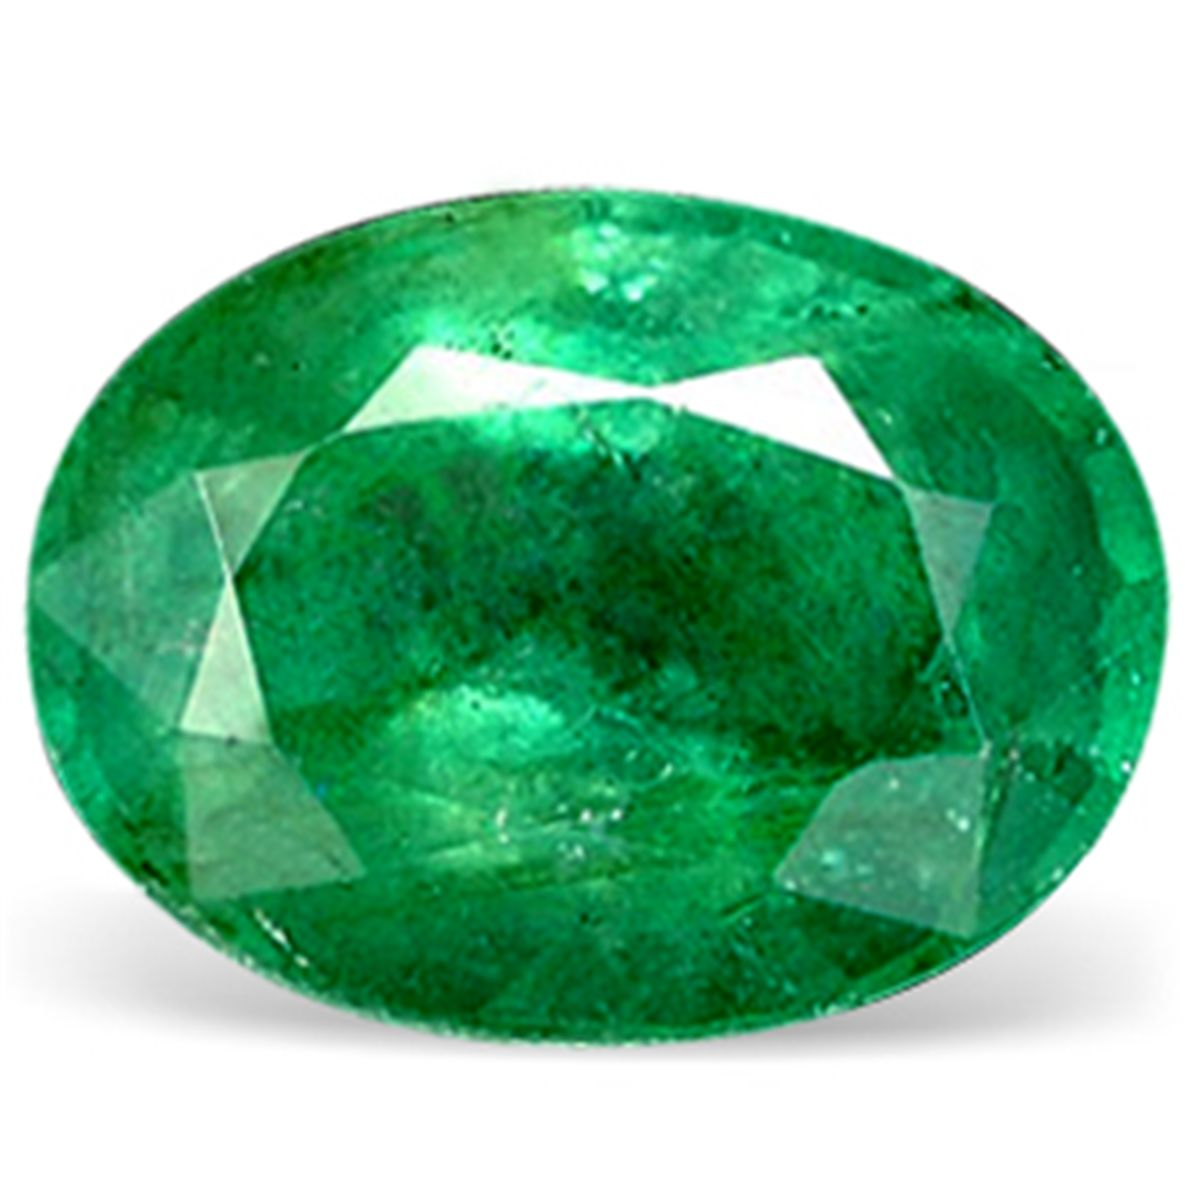 Shani Emerald: Gemstones And Their Benefits